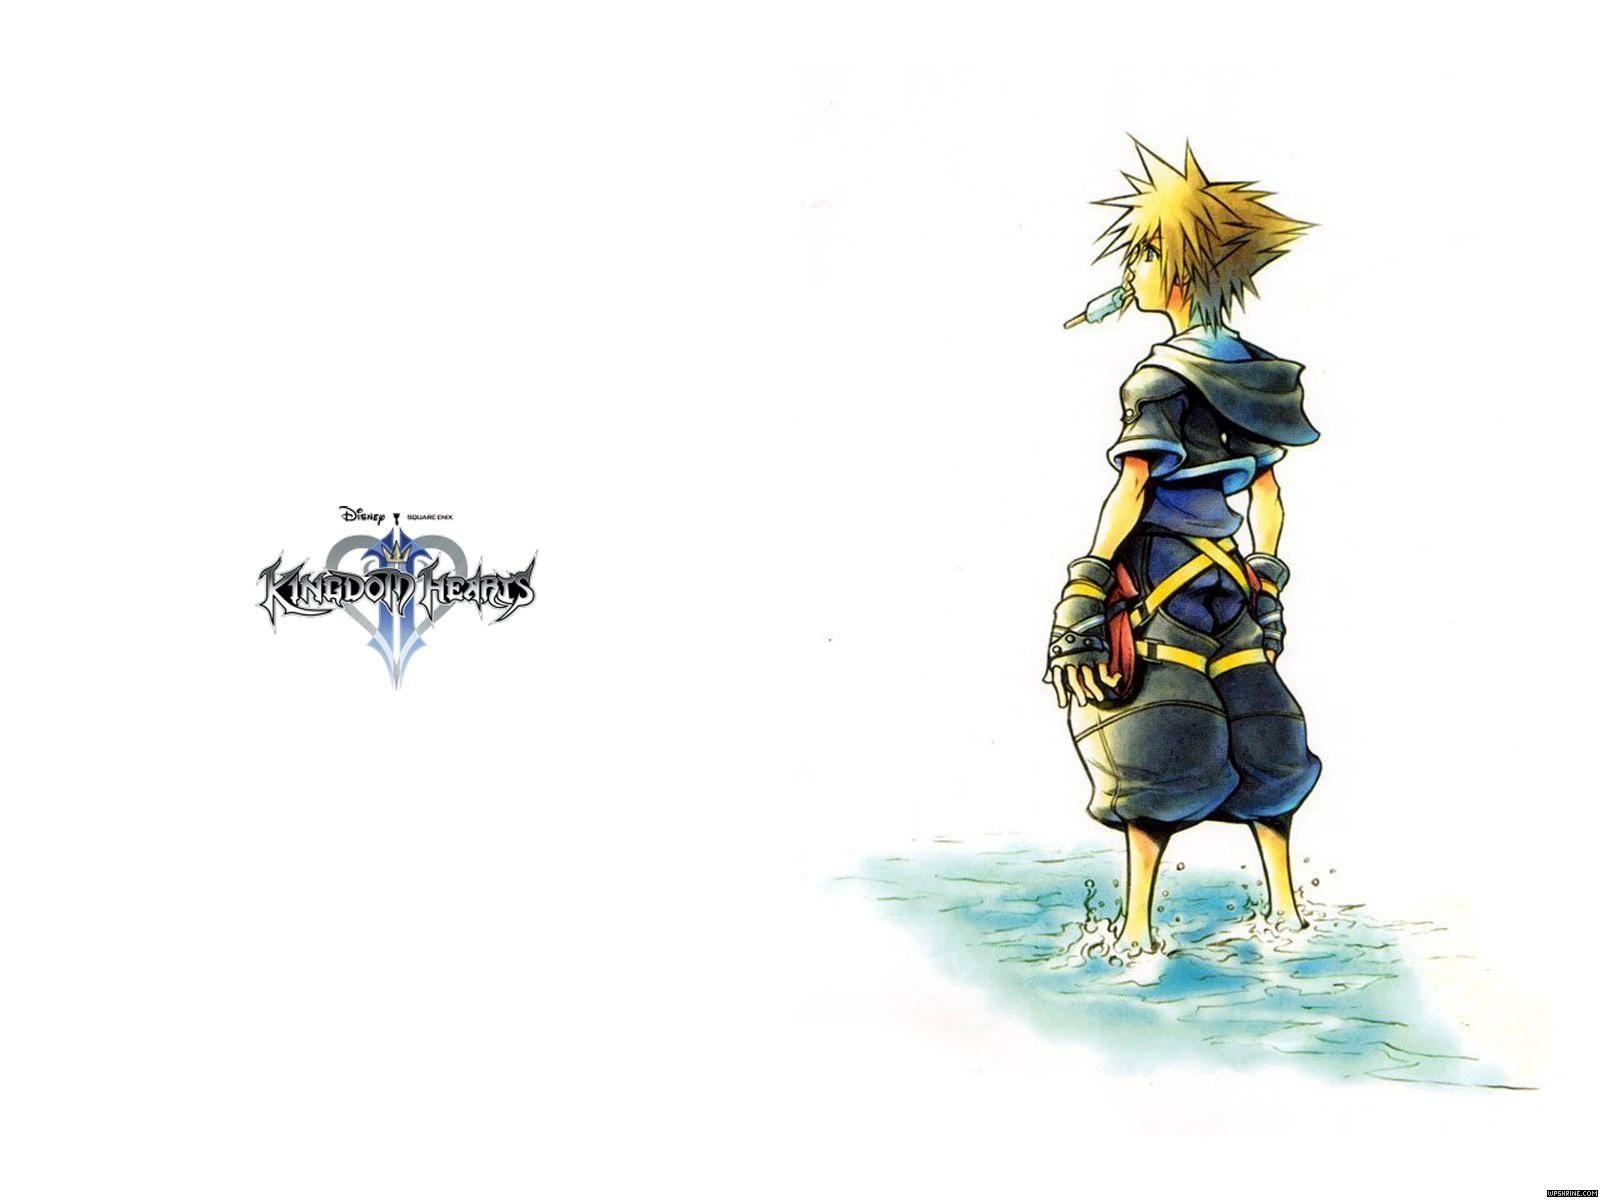 Kingdom Hearts Sora Wallpaper 1920x1080 Kingdom Hearts Wallpap...